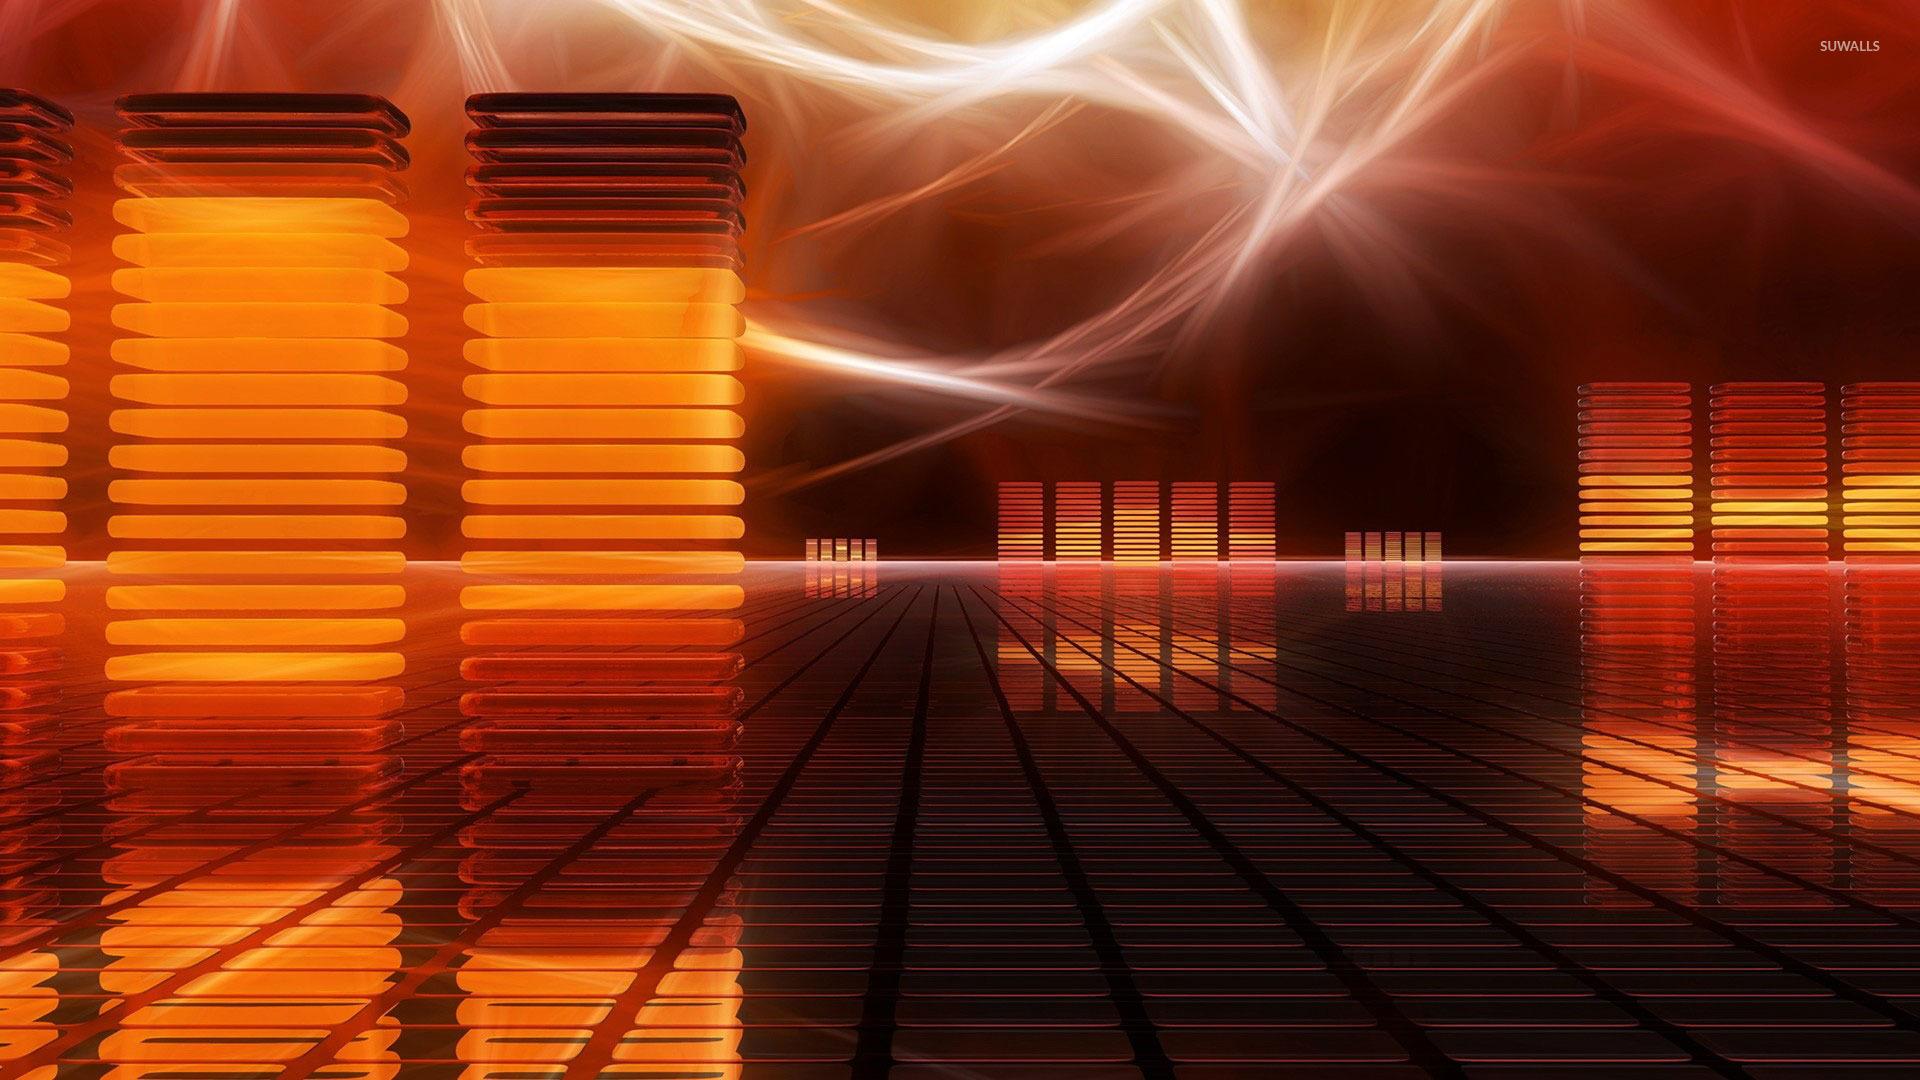 Equalizer bars wallpaper - 3D wallpapers - #24222